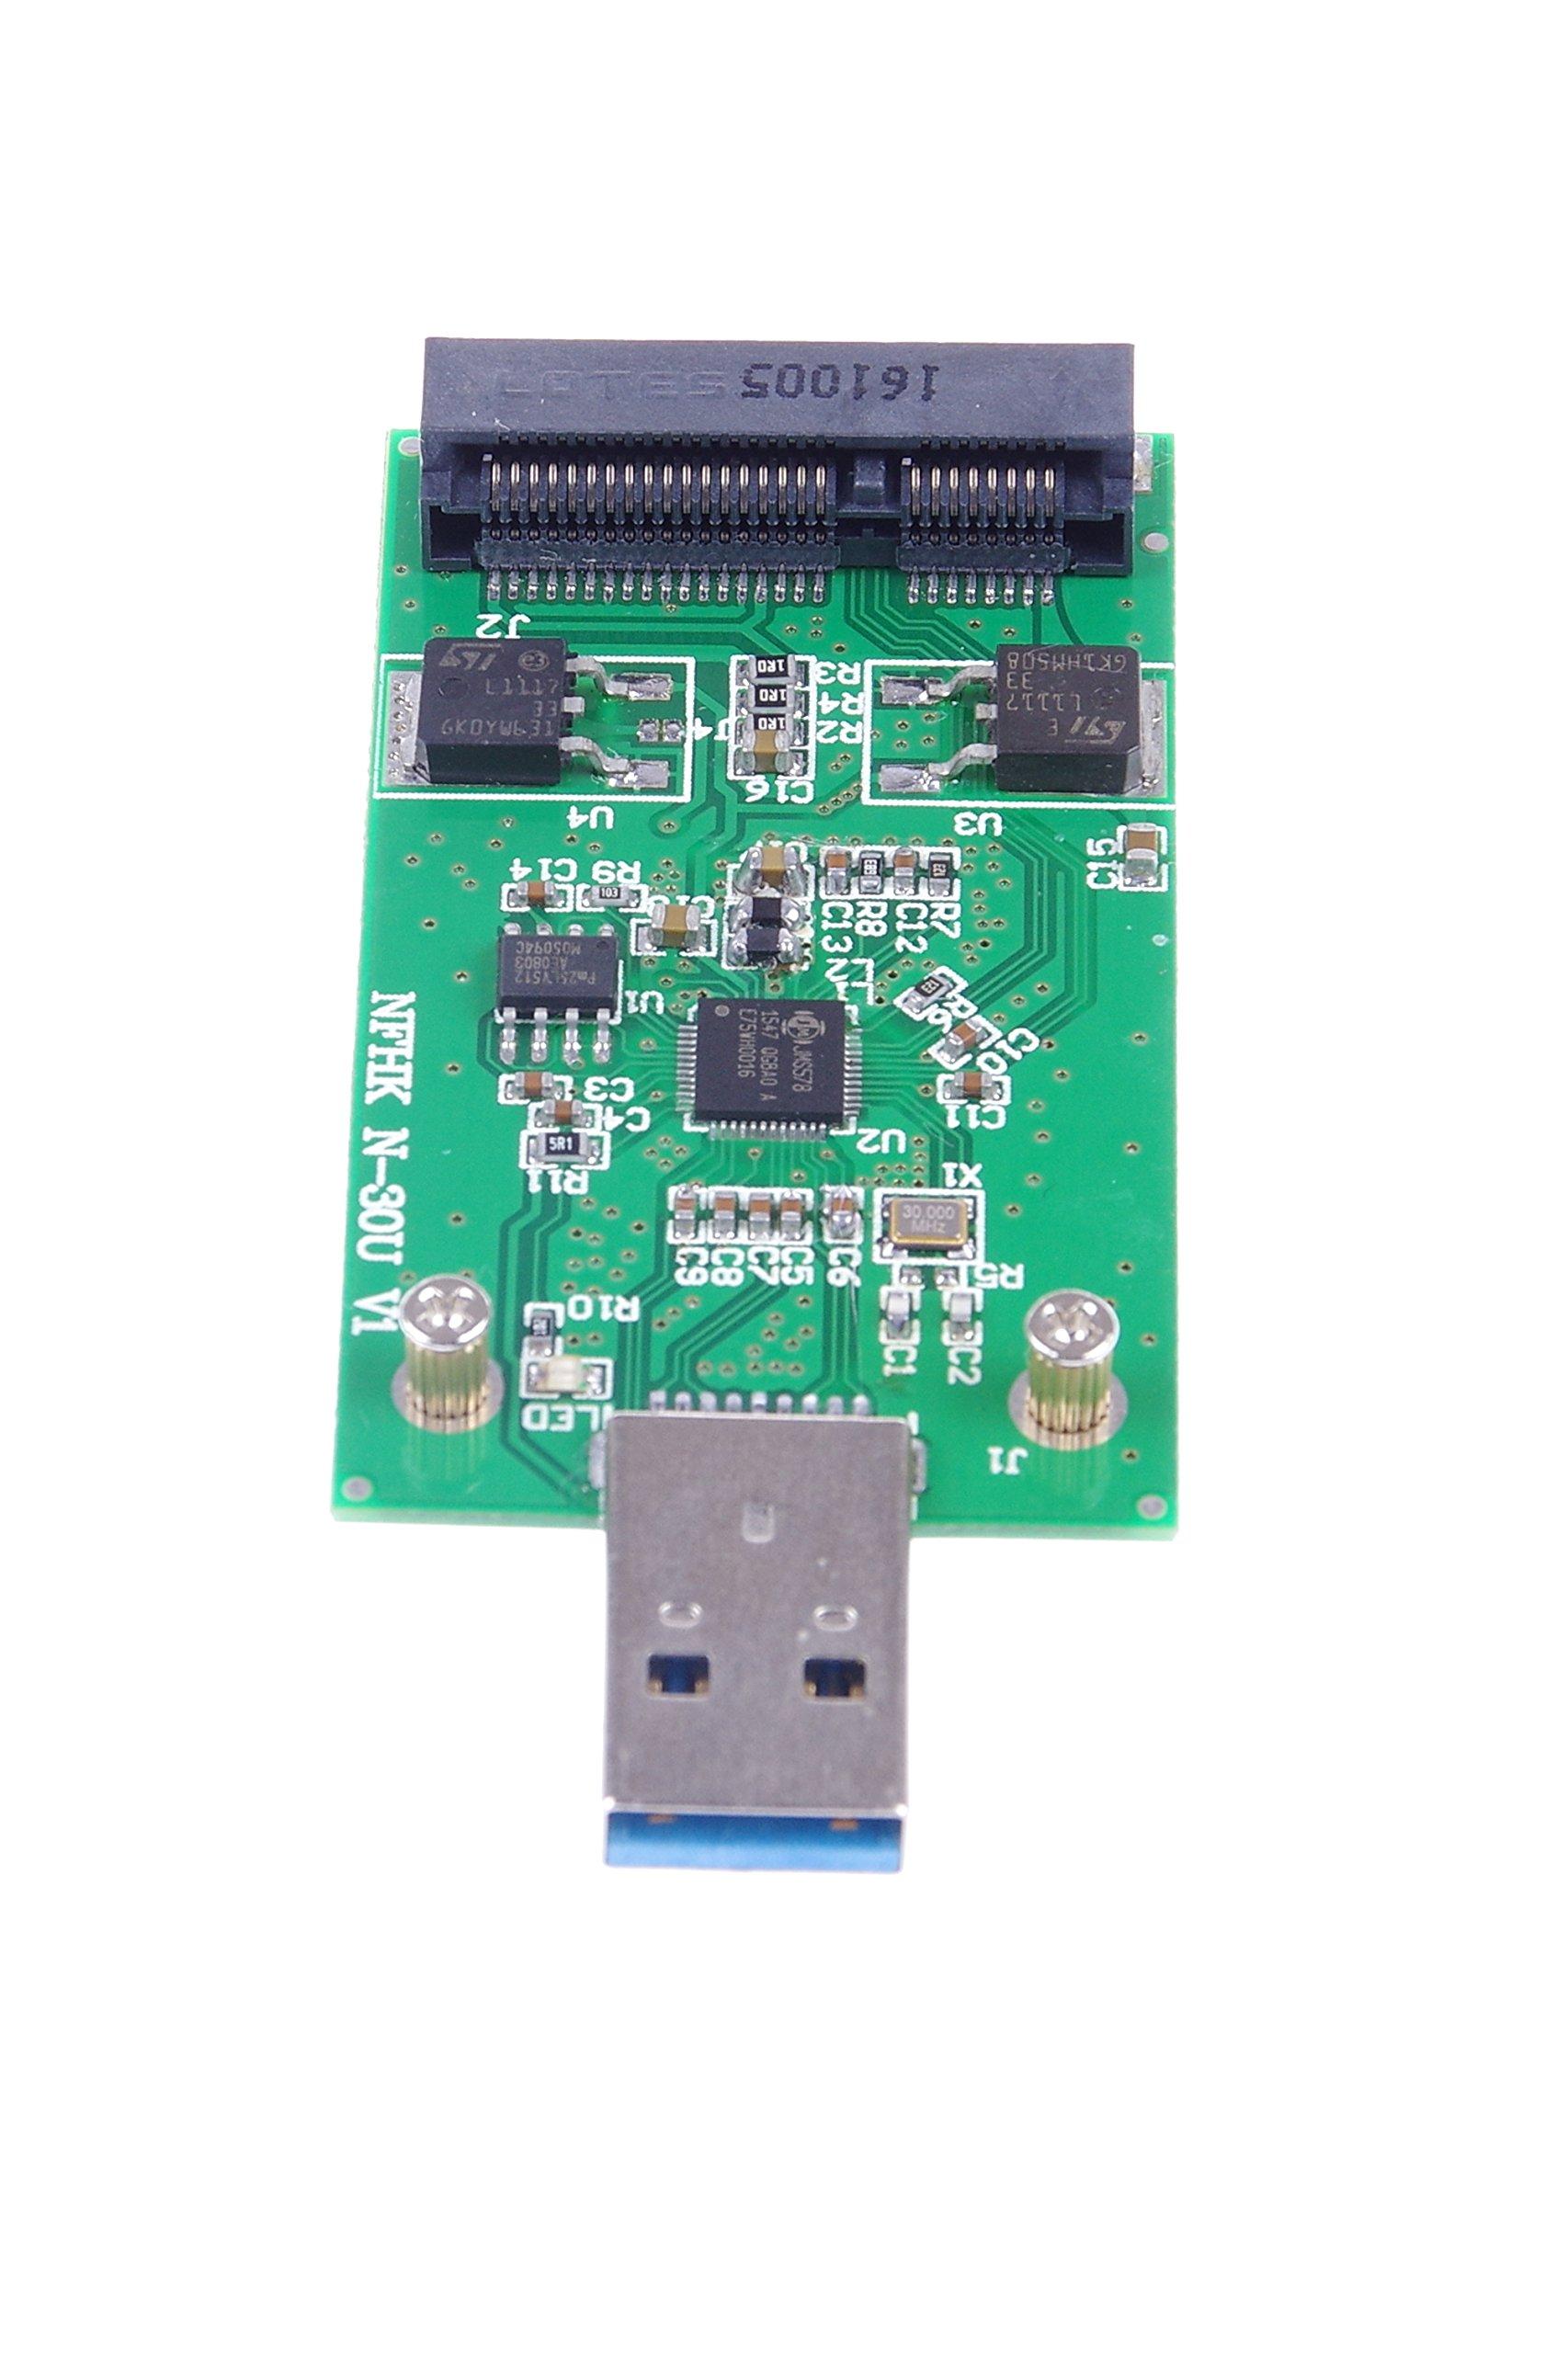 KNACRO USB 3.0 mSATA SSD Adapter as USB Disk Driver don't need USB cable USB 3.0 to mSATA SSD adapter card by KNACRO (Image #9)